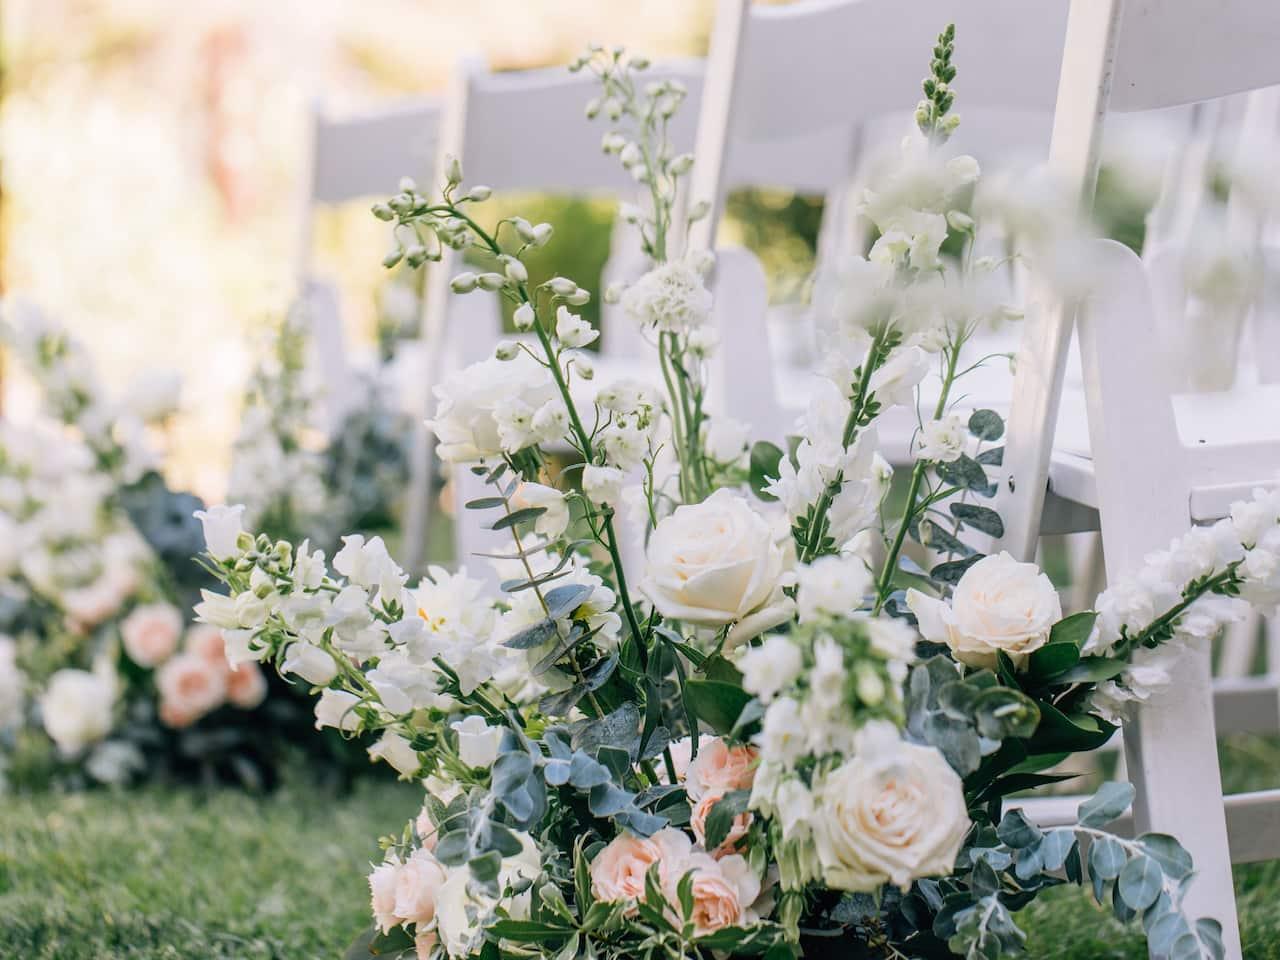 Wedding Talisa Garden Flowers